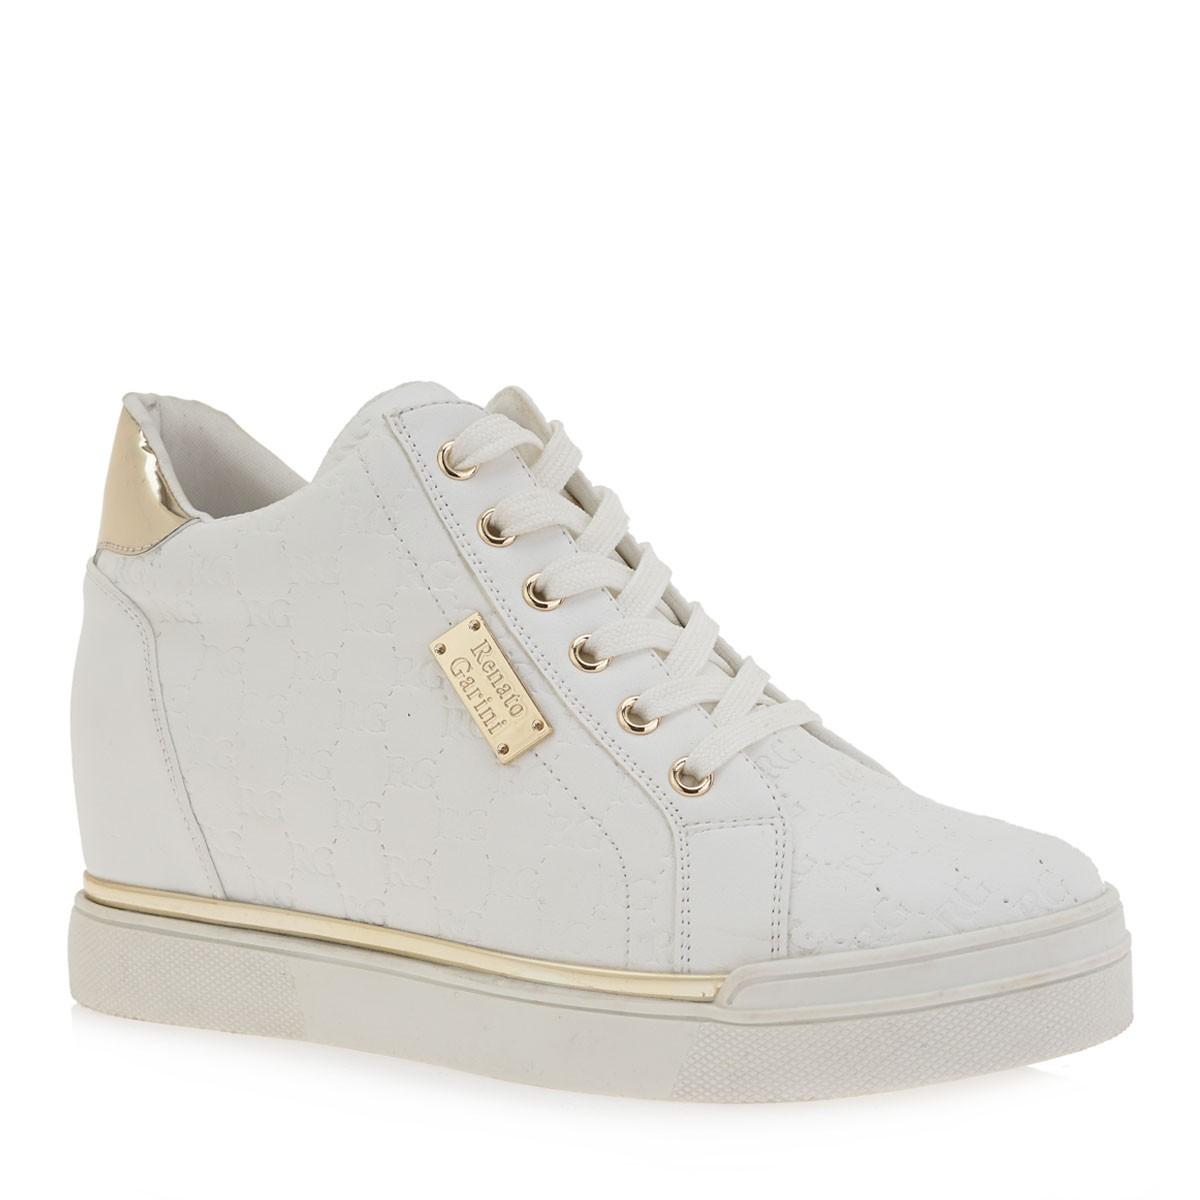 Renato Garini Γυναικεία Παπούτσια Sneakers 122-EX2122 Λευκό-Χρυσό K119R1223948